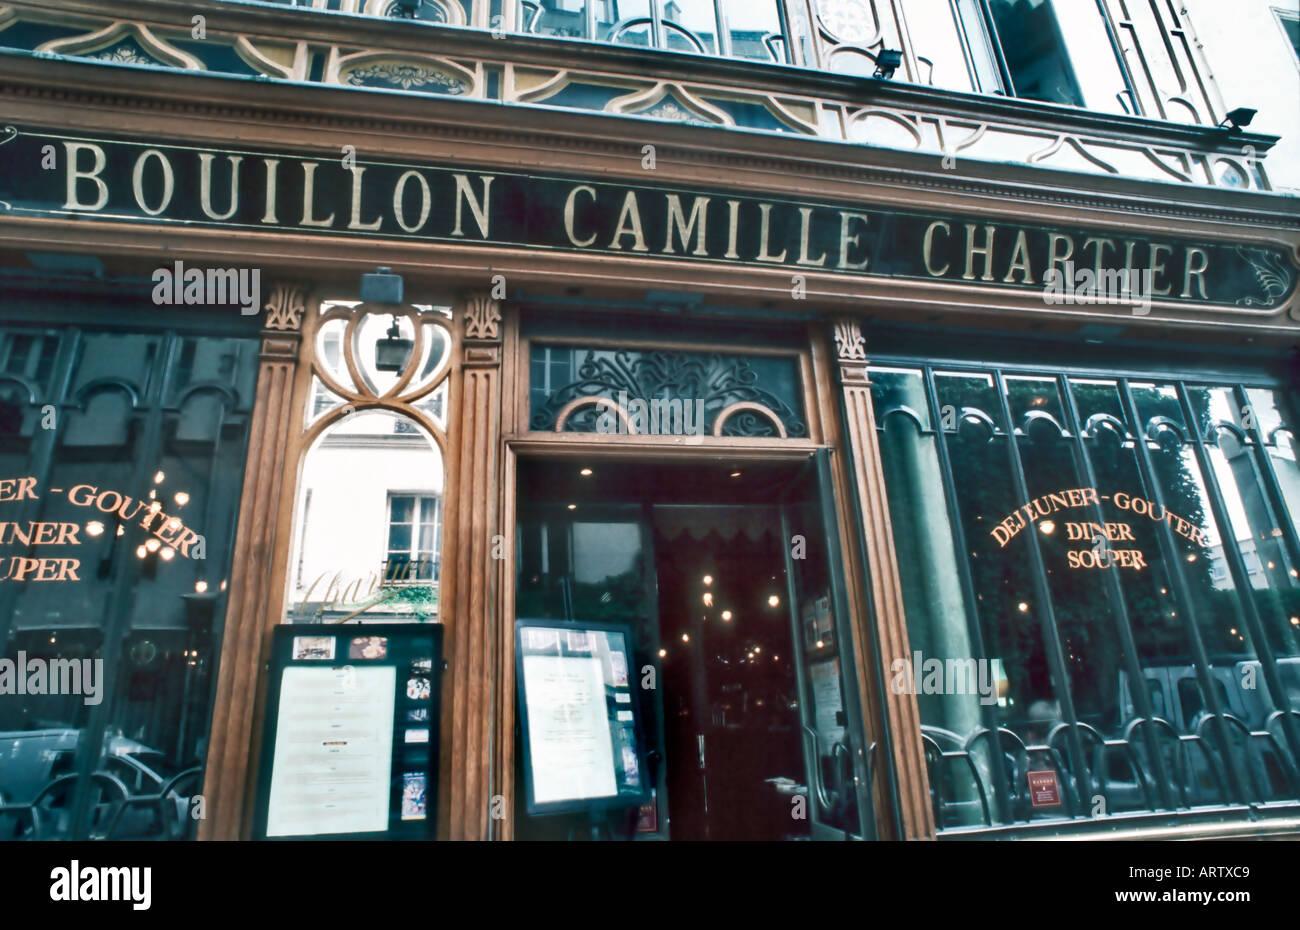 paris france traditional belgian restaurant bouillon racine art stock photo 5266120 alamy. Black Bedroom Furniture Sets. Home Design Ideas